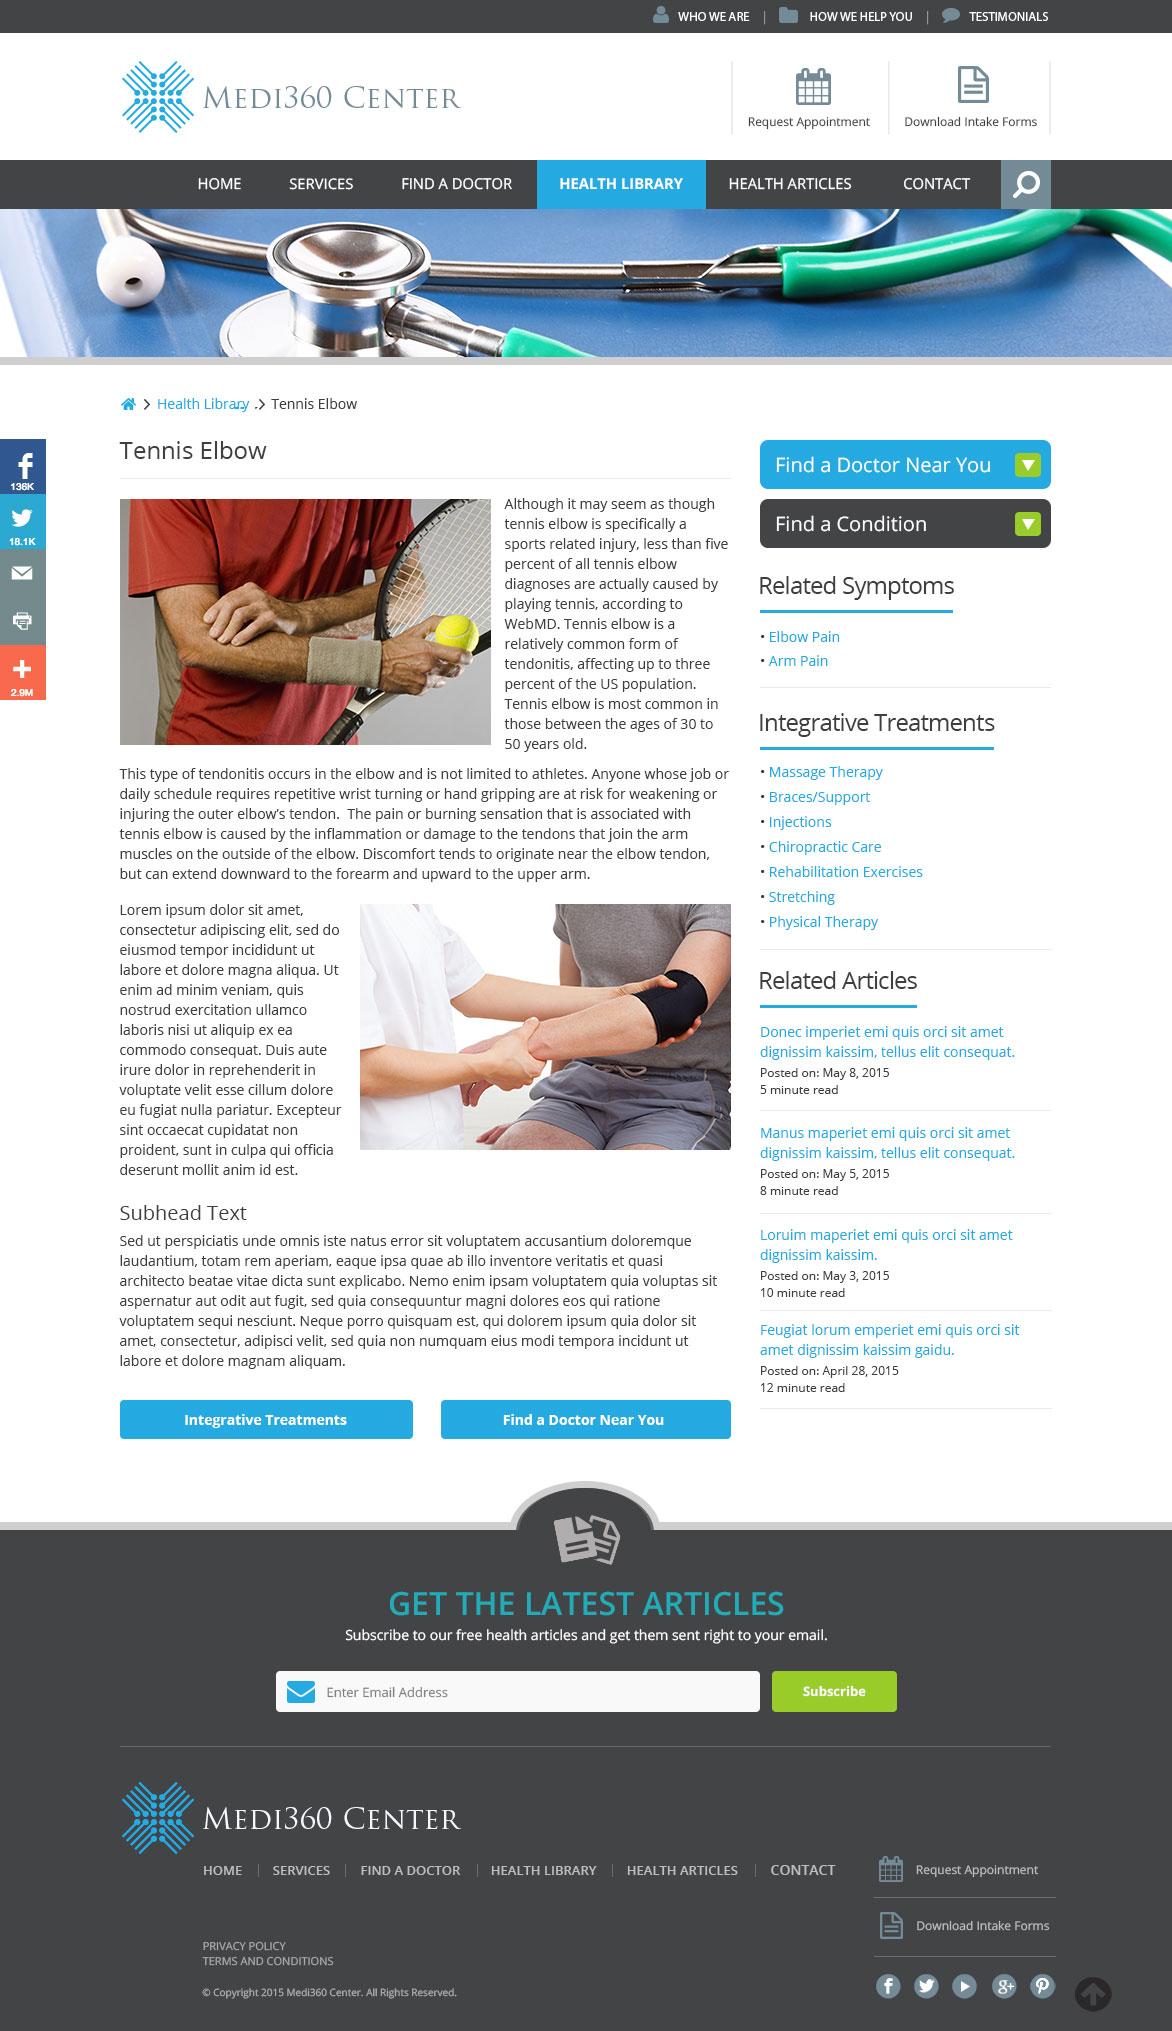 Medi360 Center Condition page